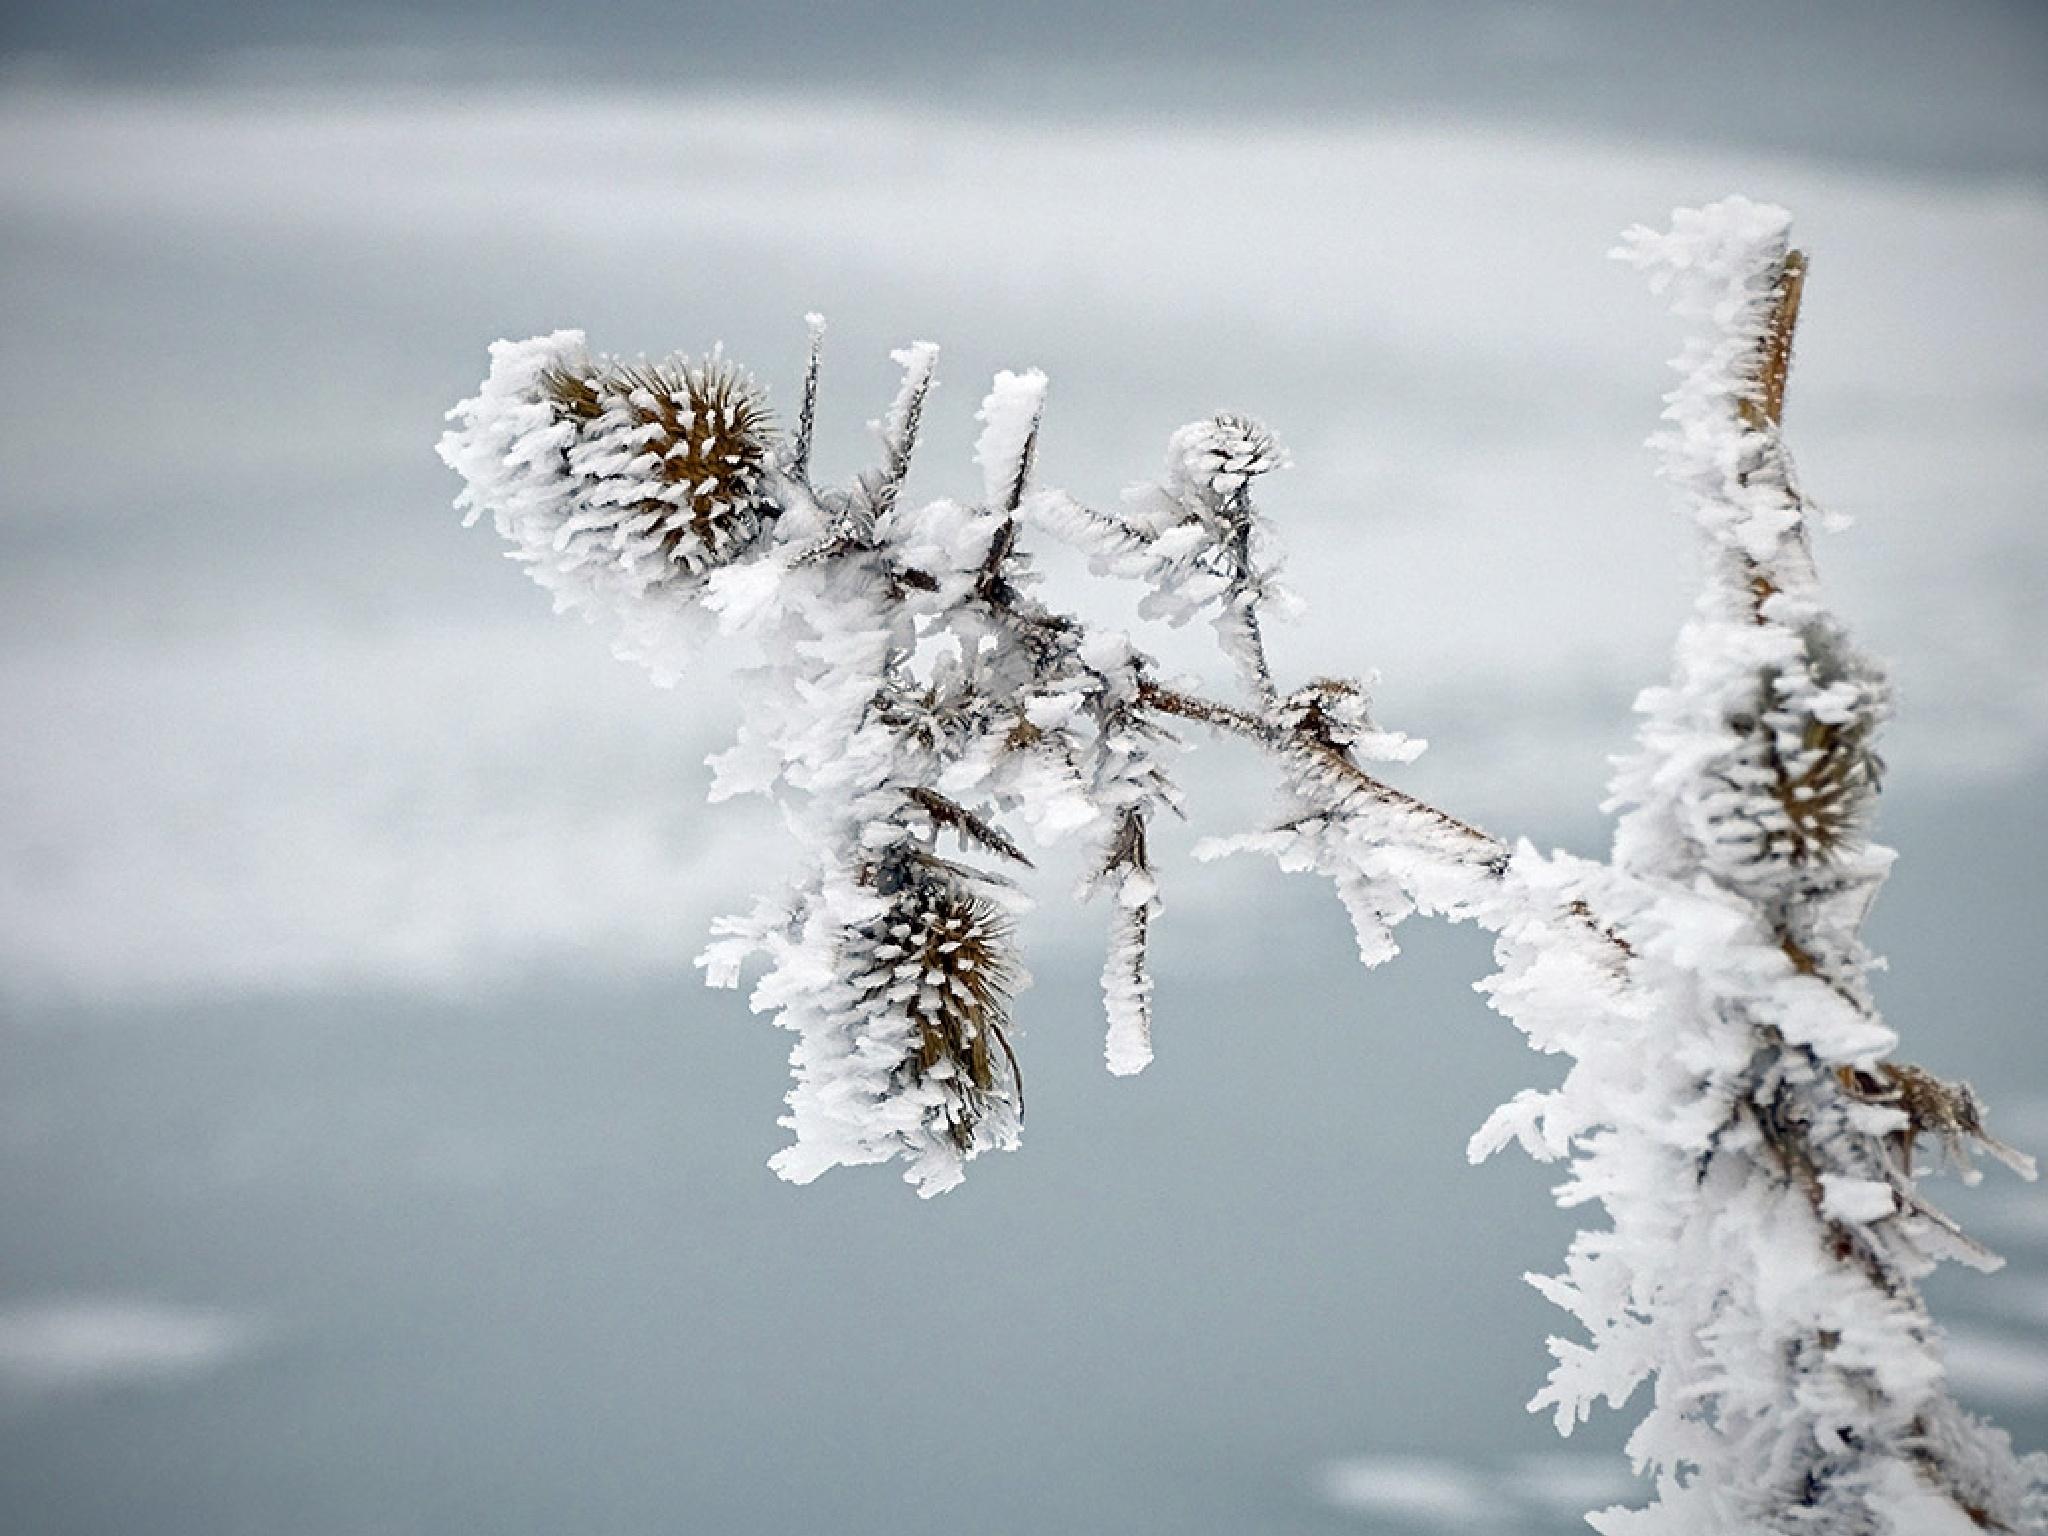 Frozen pond 3 by Jamal -Kurdistan